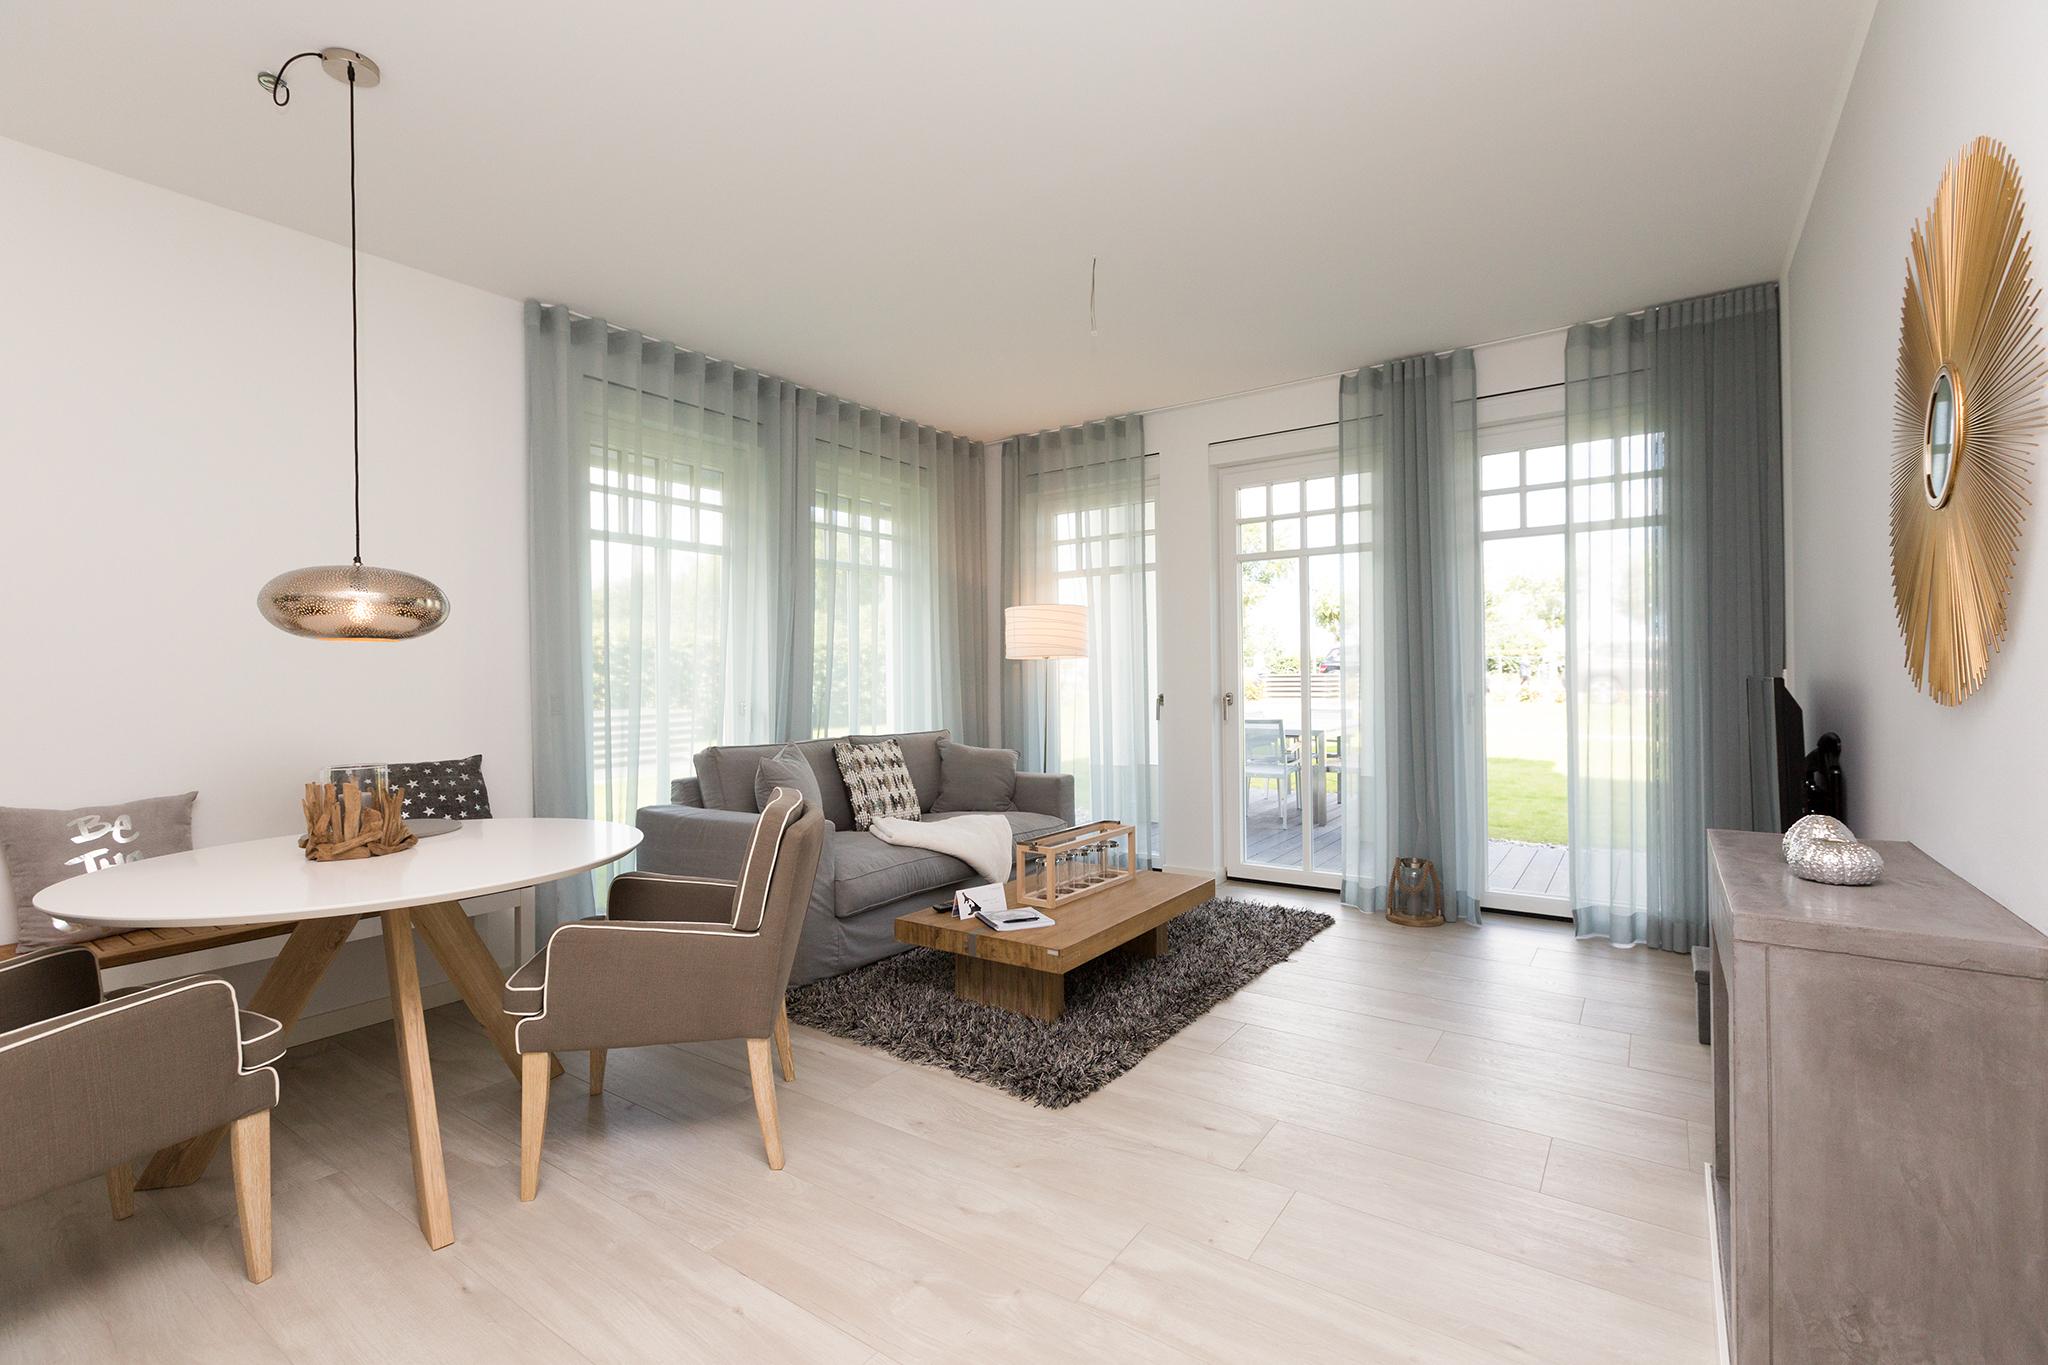 ferienwohnung in ahlbeck seebad villa westend usedomtravel. Black Bedroom Furniture Sets. Home Design Ideas